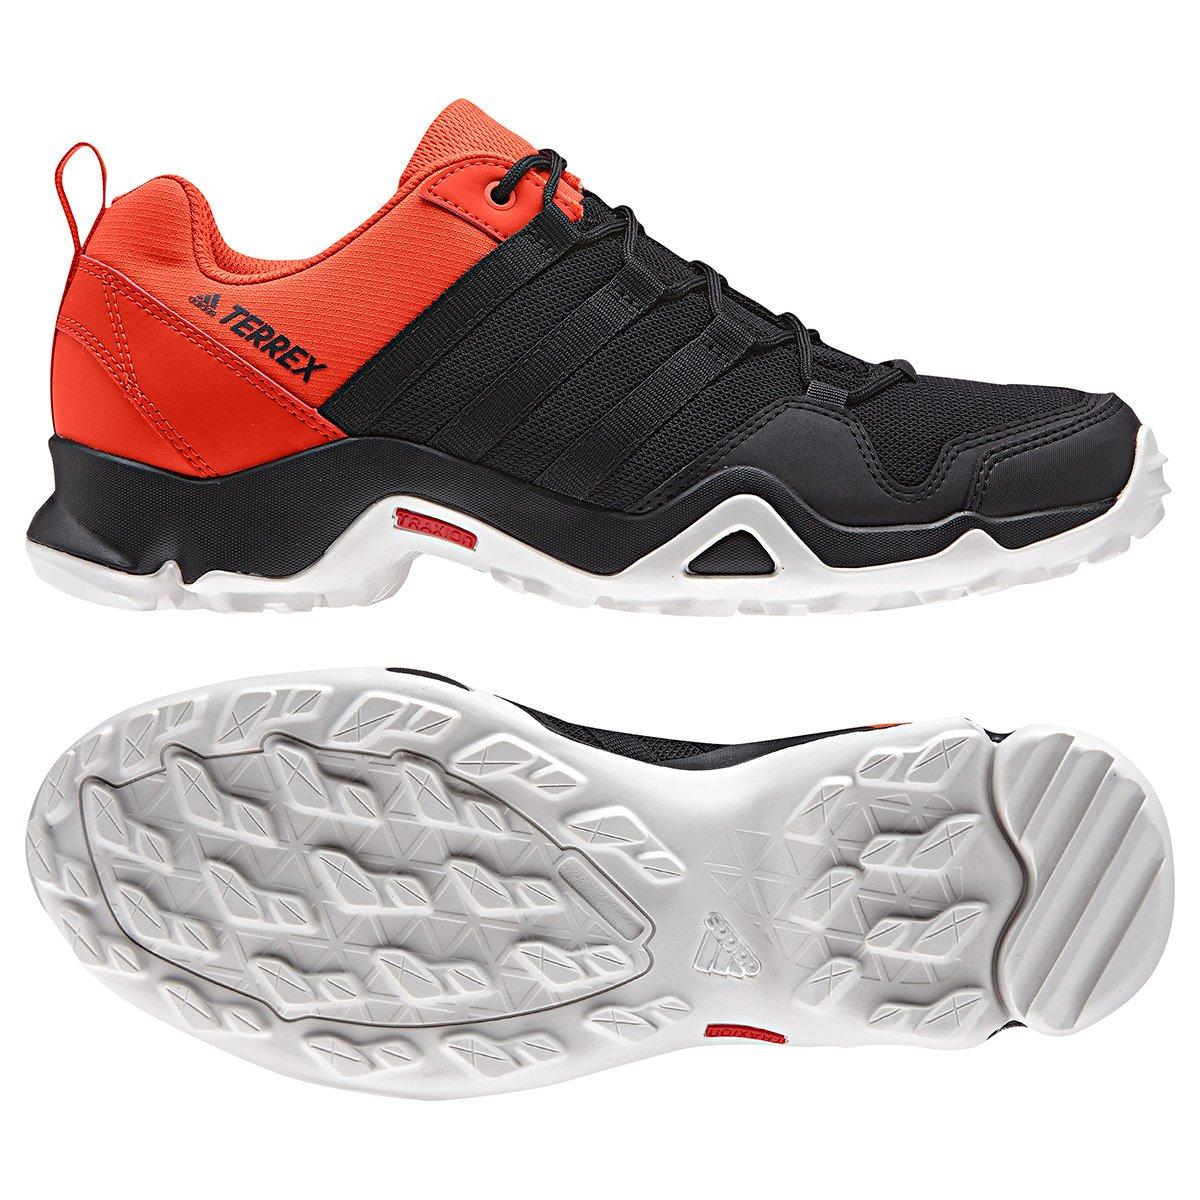 5f0d2fdcc Tênis Adidas Terrex Ax2R Masculino - Compre Agora